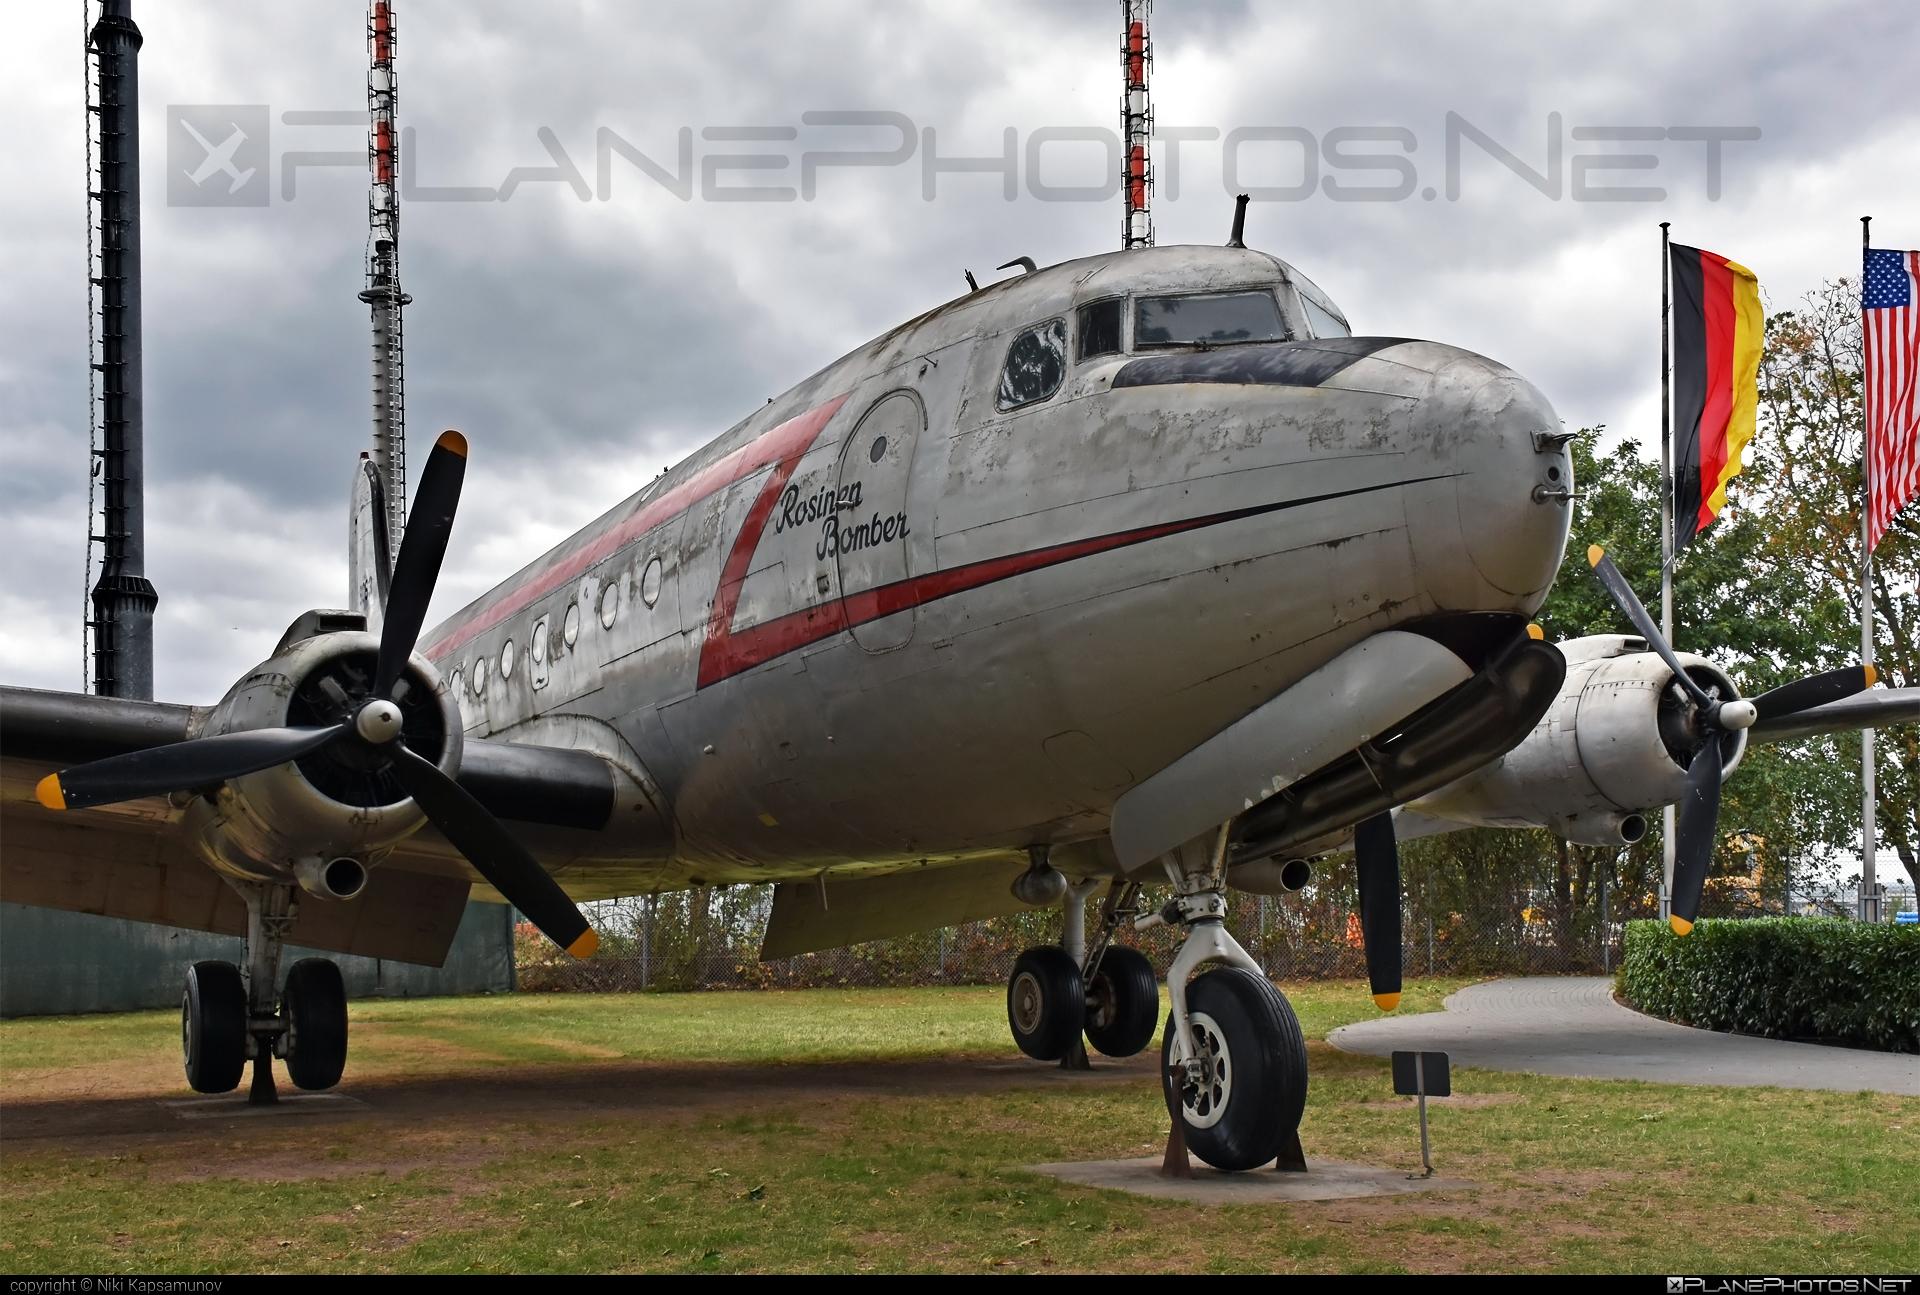 Douglas C-54E Skymaster - 44-9063 operated by US Air Force (USAF) #berlinairliftmemorial #douglas #rosinenbomber #usaf #usairforce